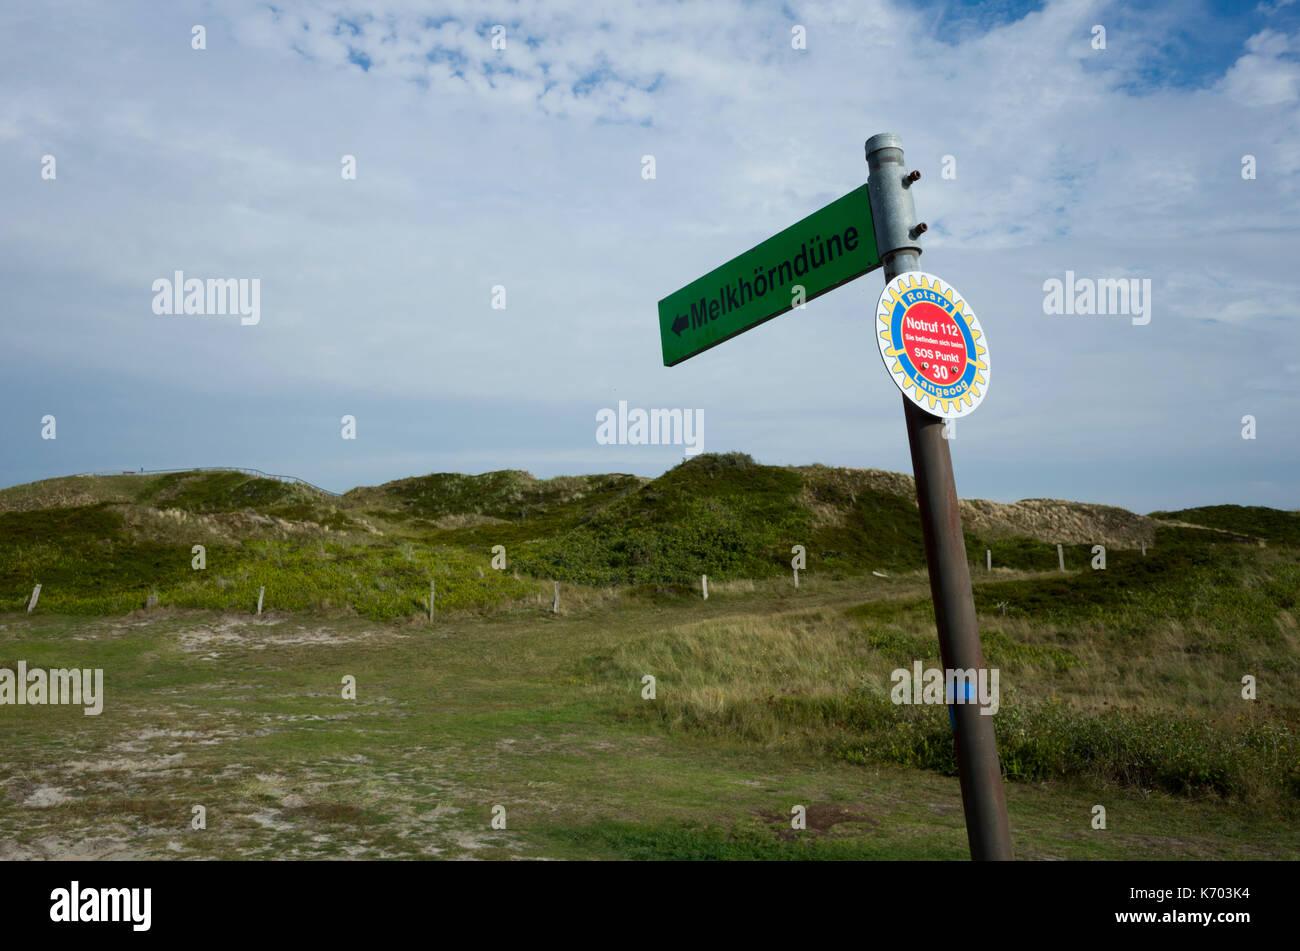 Melkhörndüne, Langeoog.  Deutschland.  Germany.  A signpost directing tourists towards the Melkhörndüne sand dunes attraction.  It's a bright hazy day with light cloud cover. - Stock Image